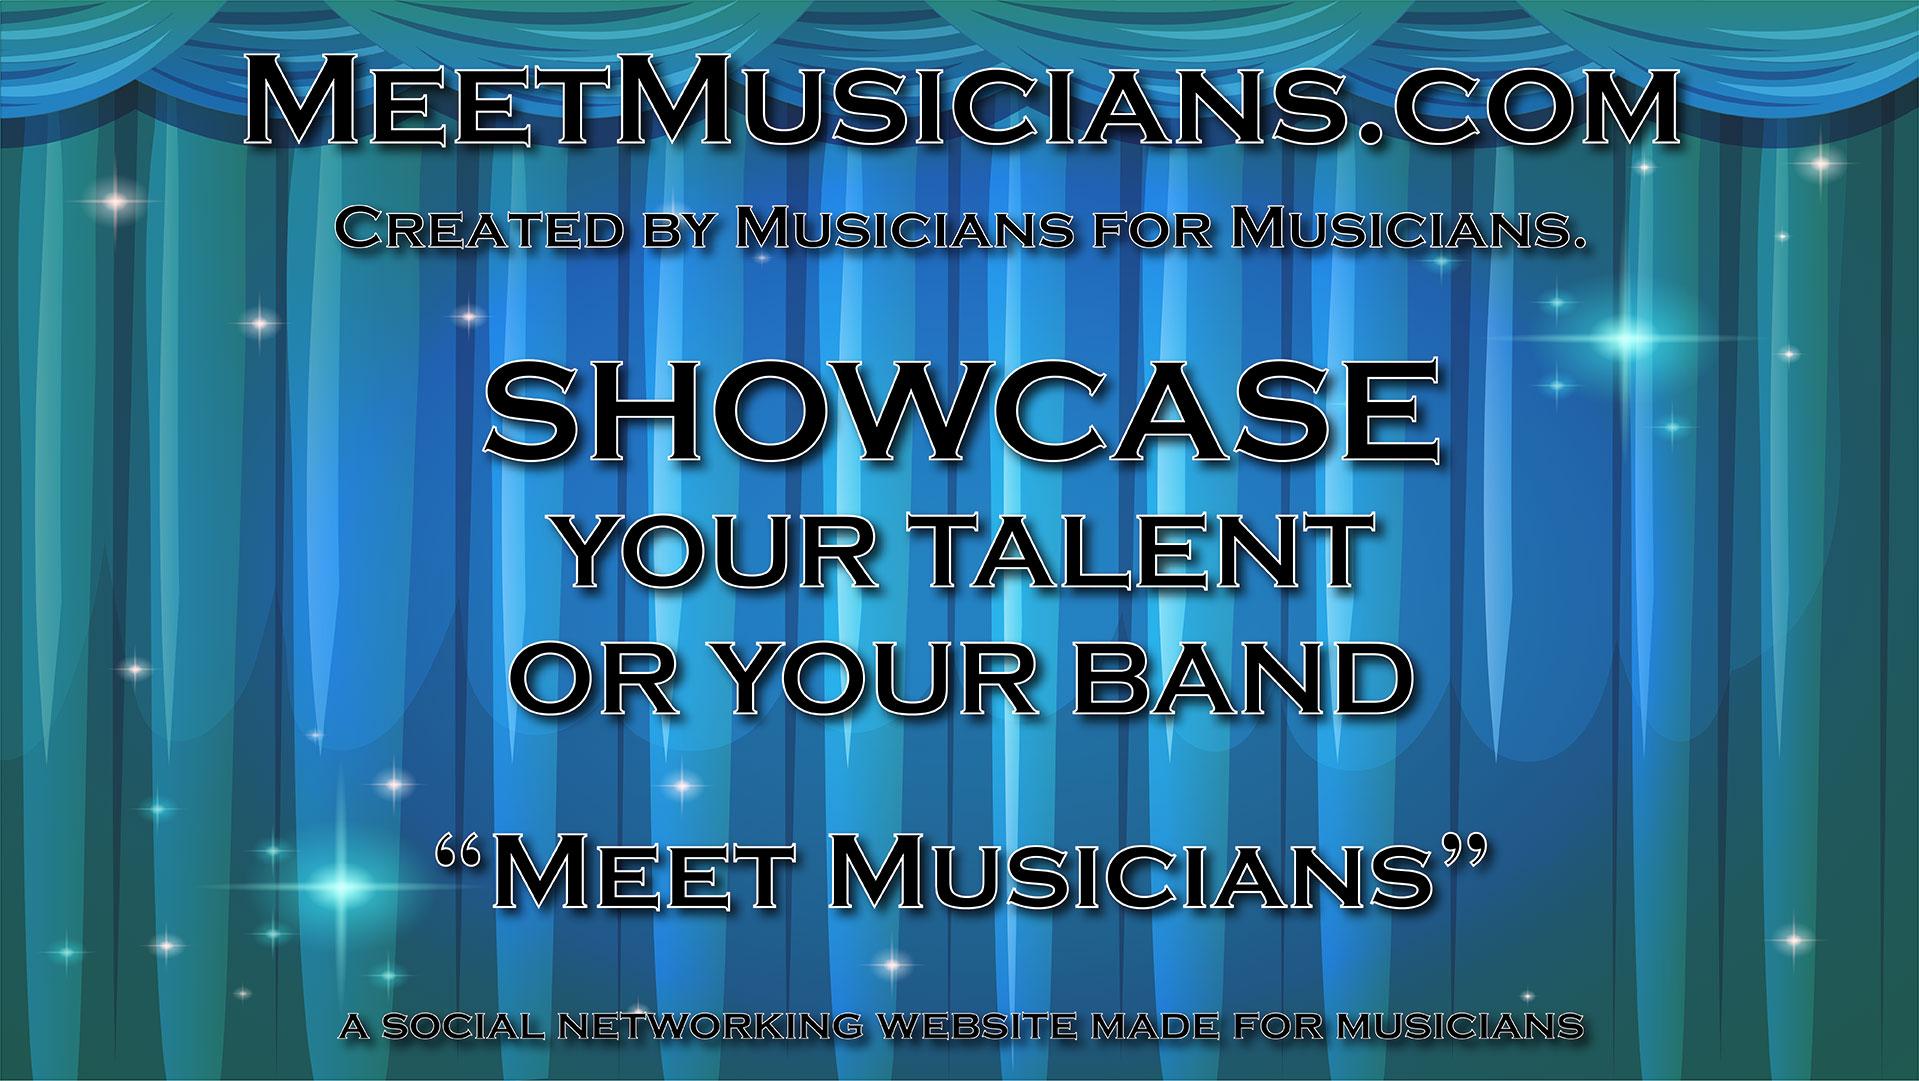 MeetMusicians.com